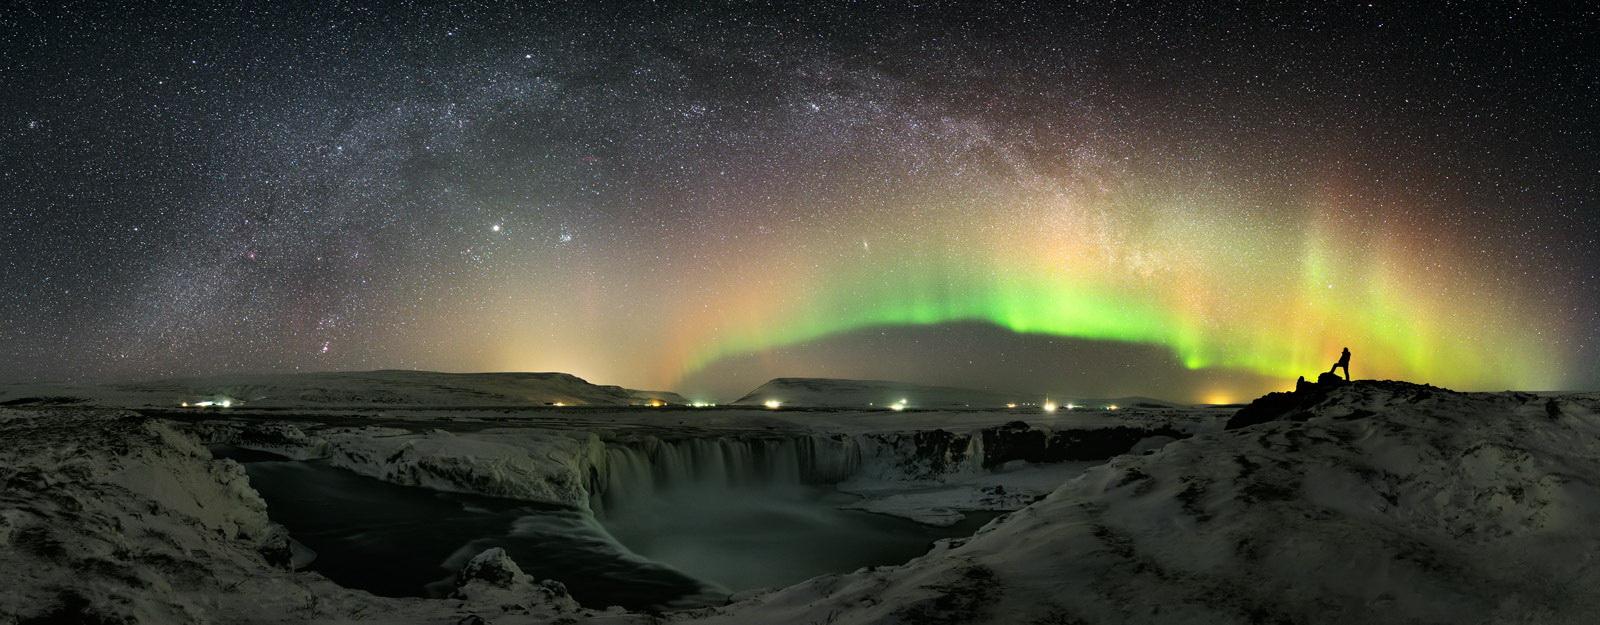 waterfall-of-the-gods Stéphane Vetter captures stunning aurora borealis photos Exposure